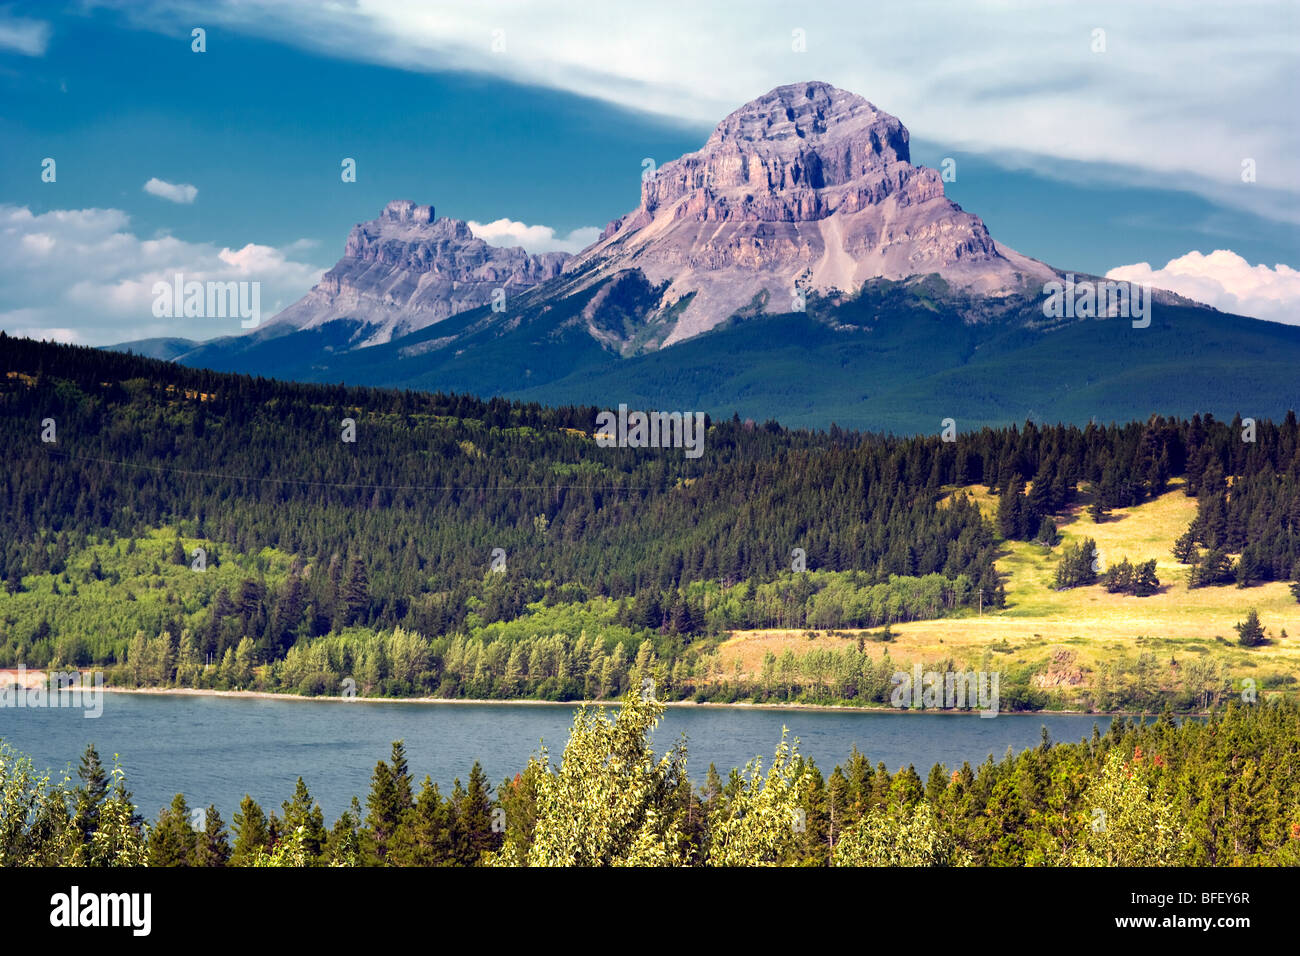 Crowsnest Mountain, Alberta, Canada, Rockies, lake - Stock Image